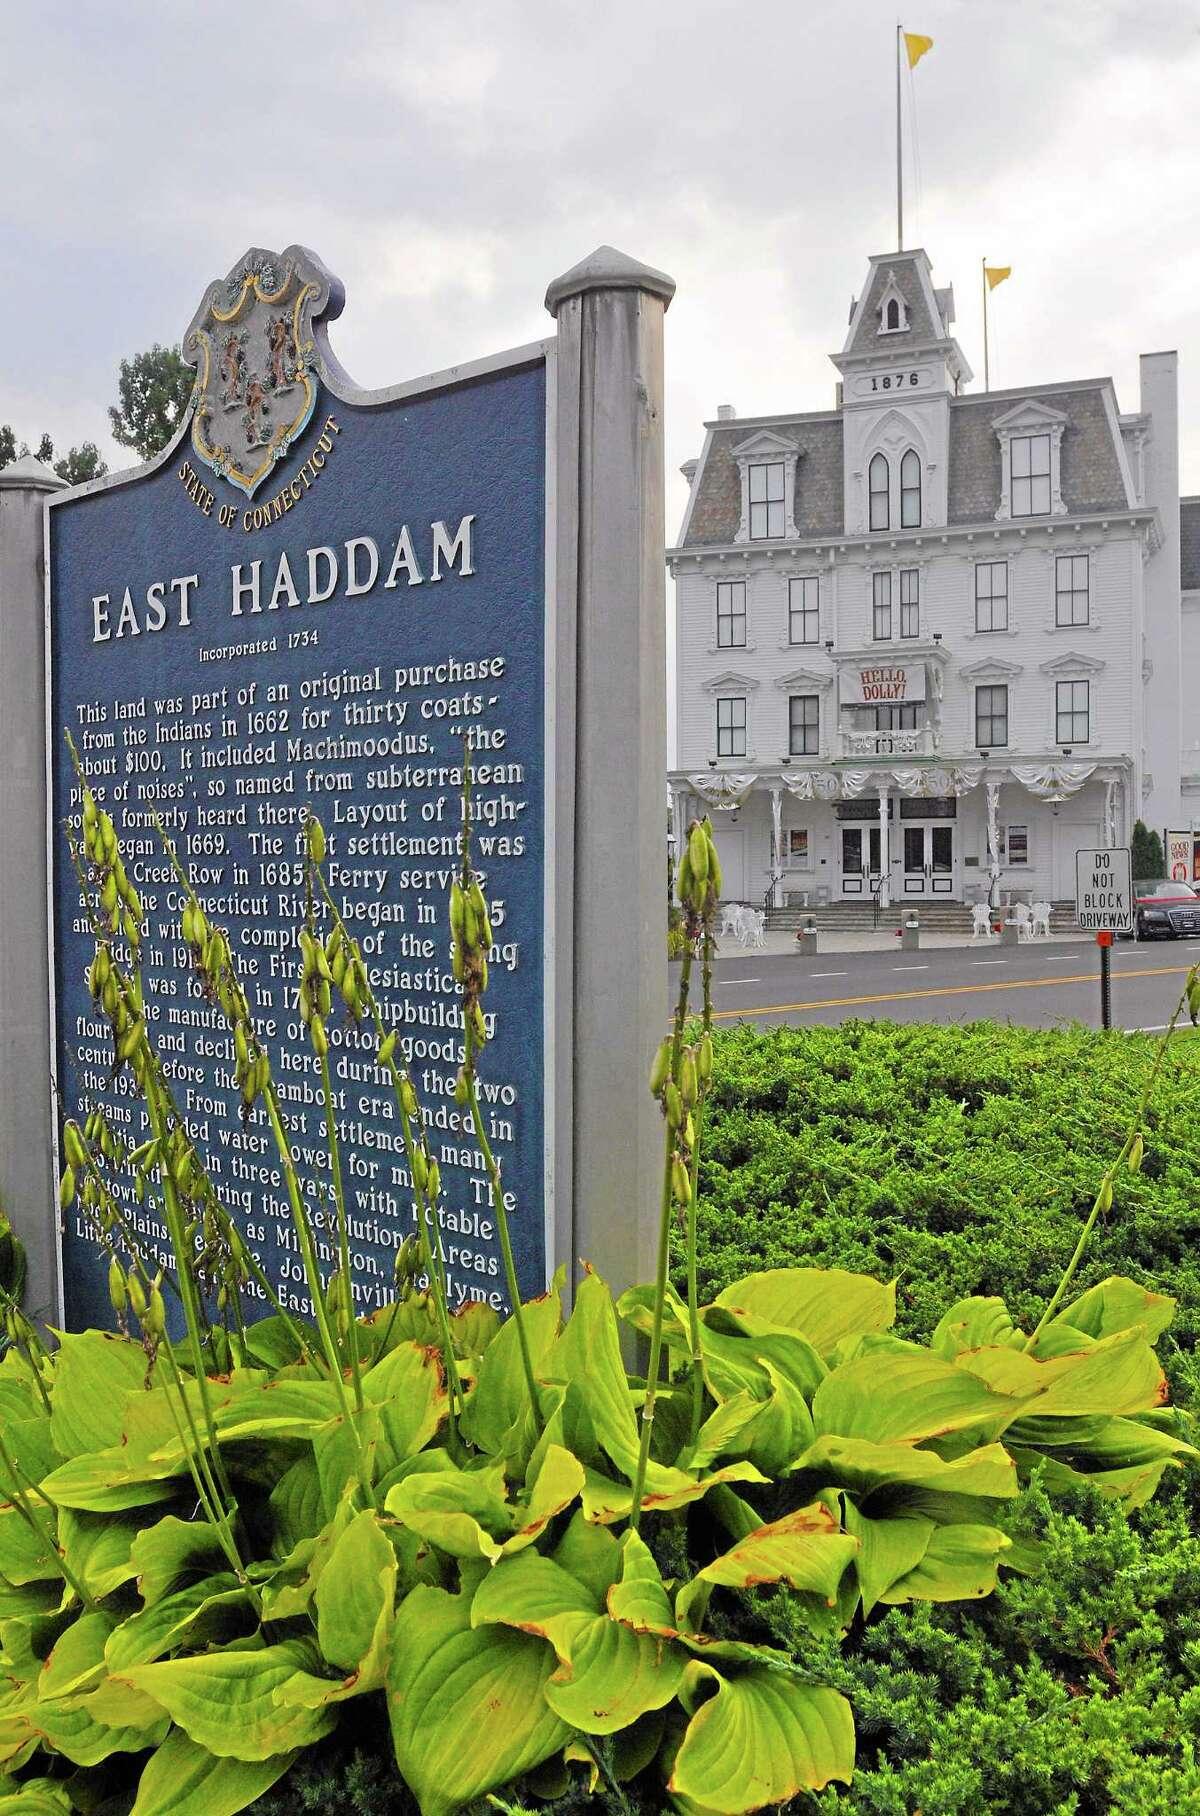 East Haddam.